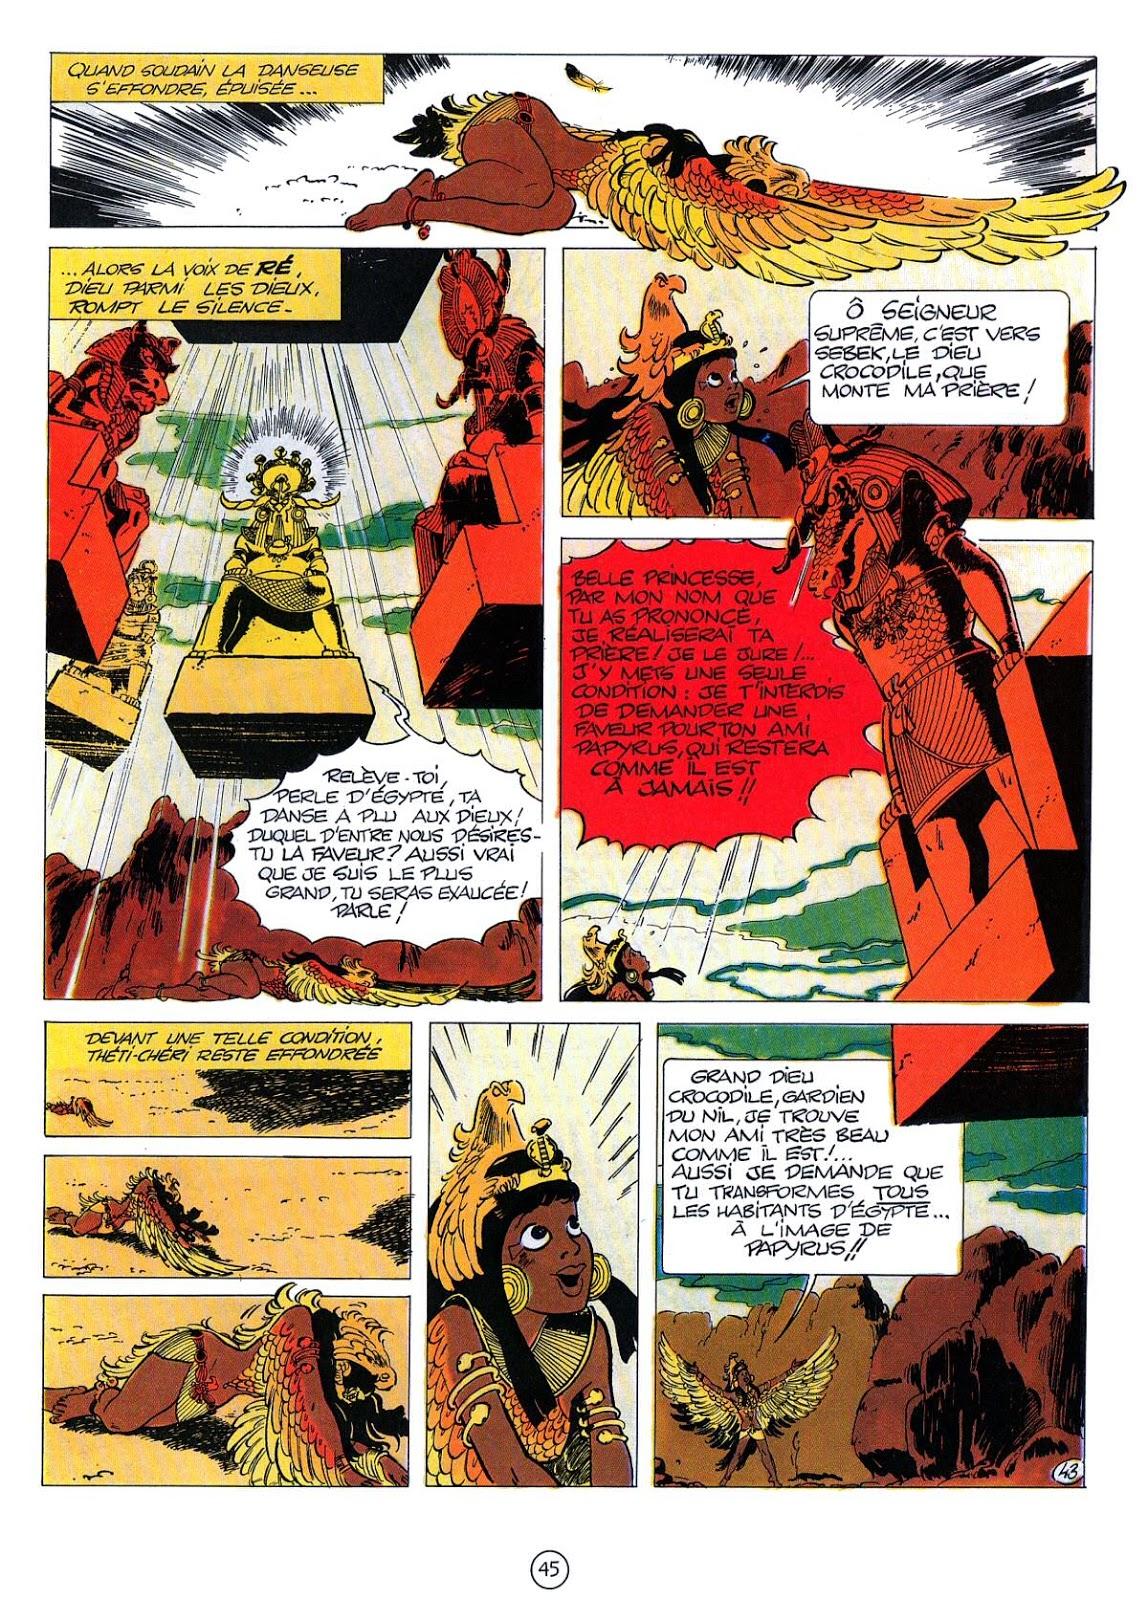 Les Héroïnes de BD: Théti-chéri ( Papyrus )